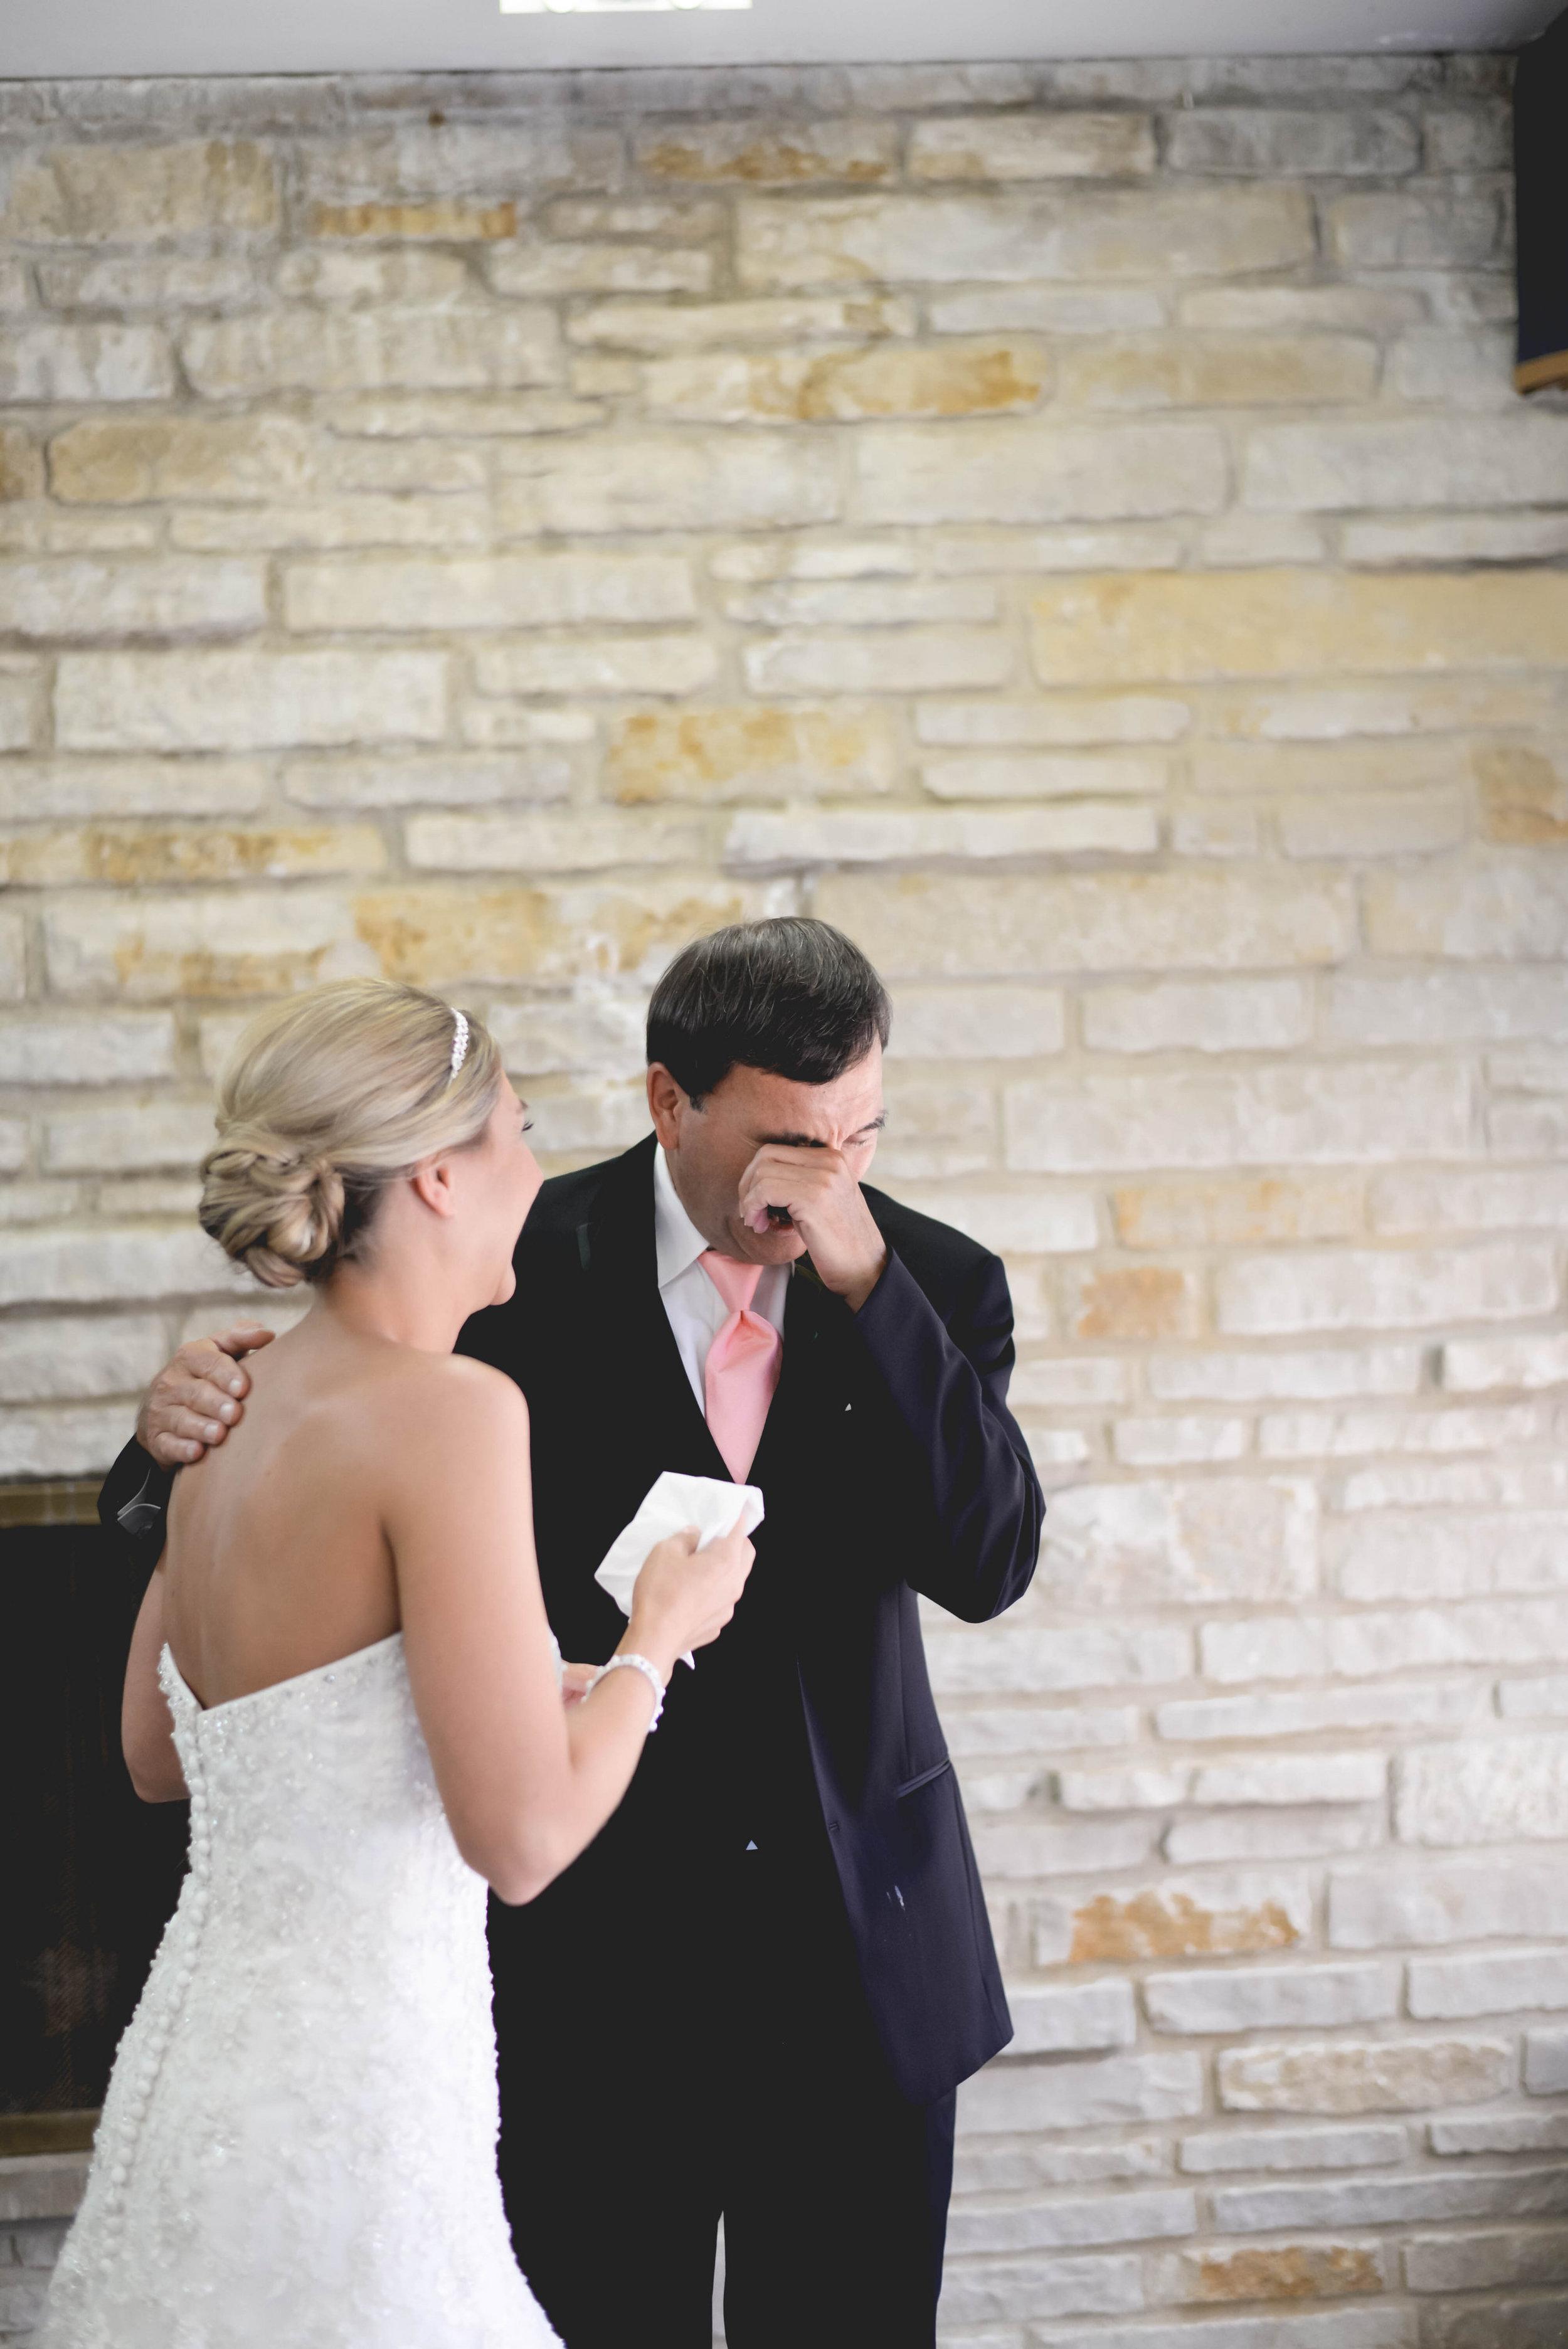 Donelson Wedding-Donelson-0051.jpg